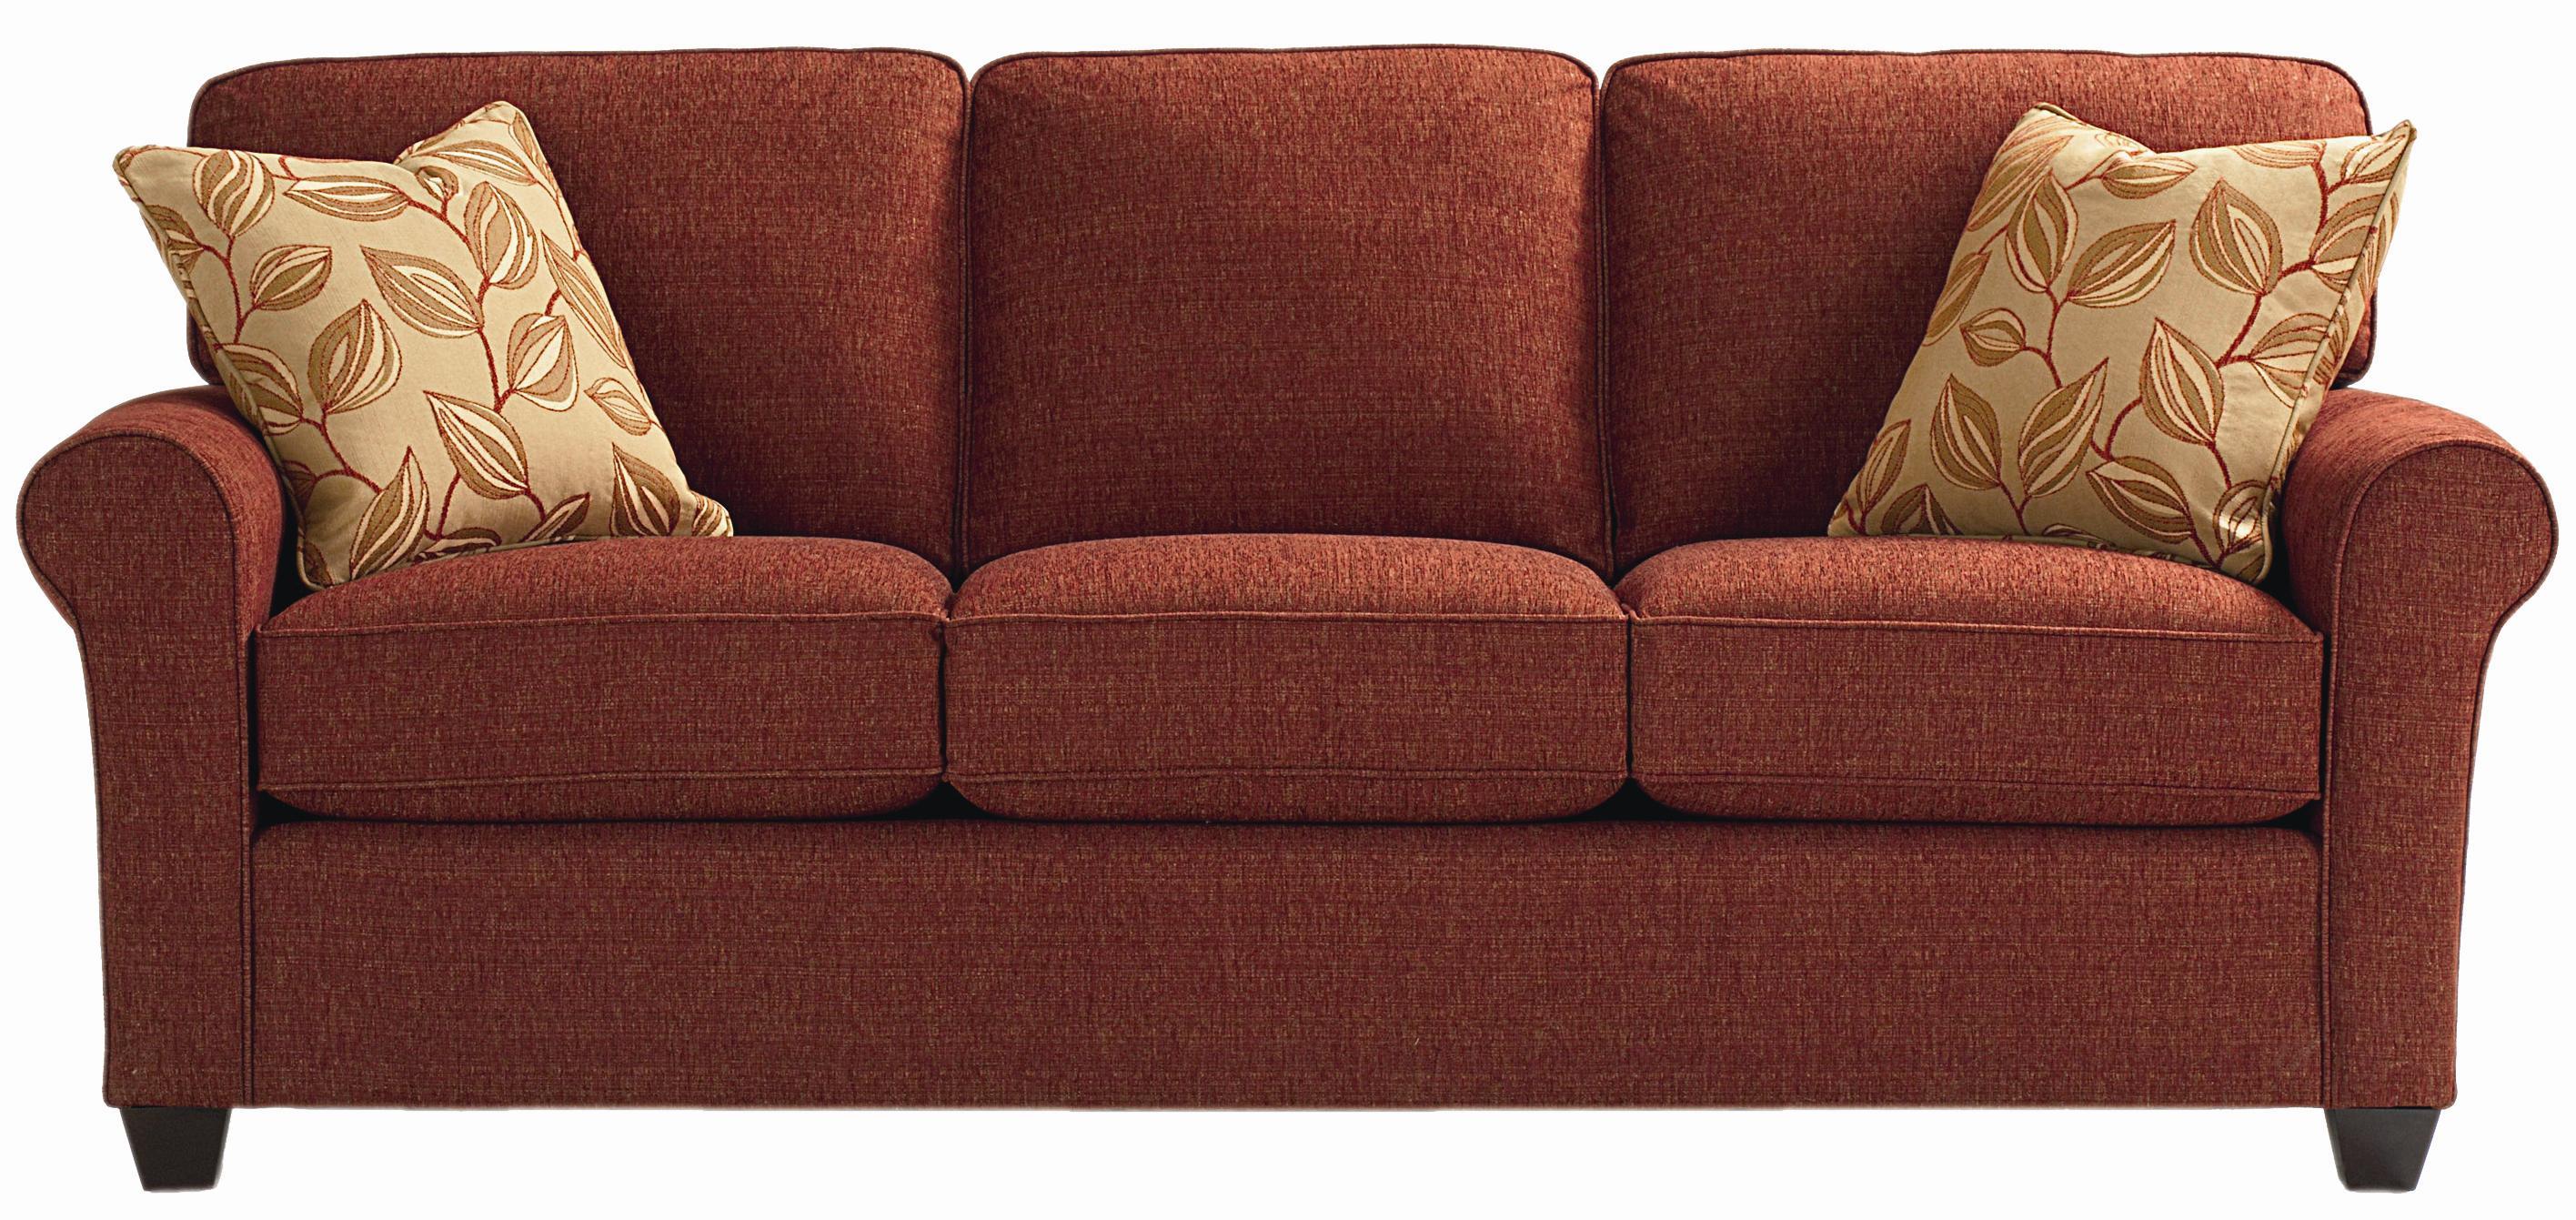 bassett brewster upholstered stationary sofa adcock furniture sofas rh adcockfurniture com bassett brewster sofa price Pit Sectional Sofa